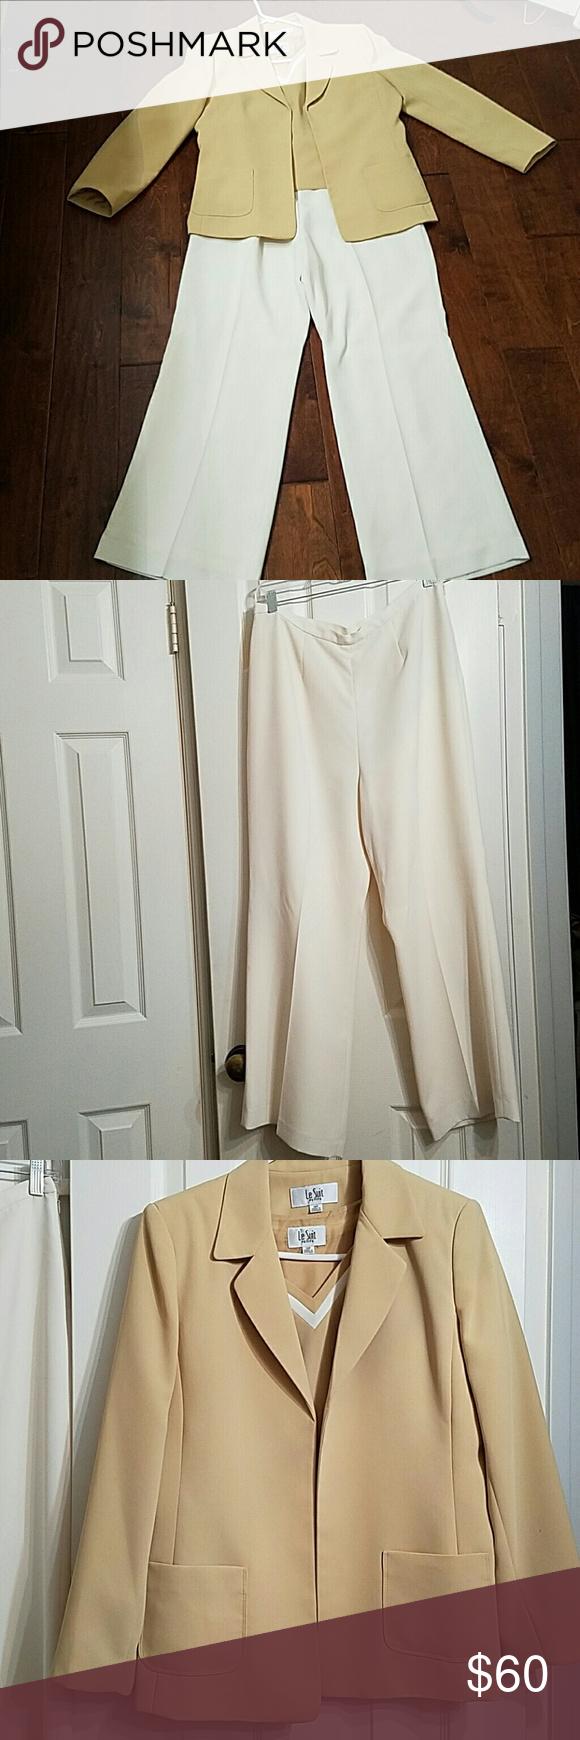 3 piece suit set Camel colored 3 piece suit. Sleeveless blouse. Blazer with lightly padded shoulders. Cream pants Le Suit Jackets & Coats Blazers